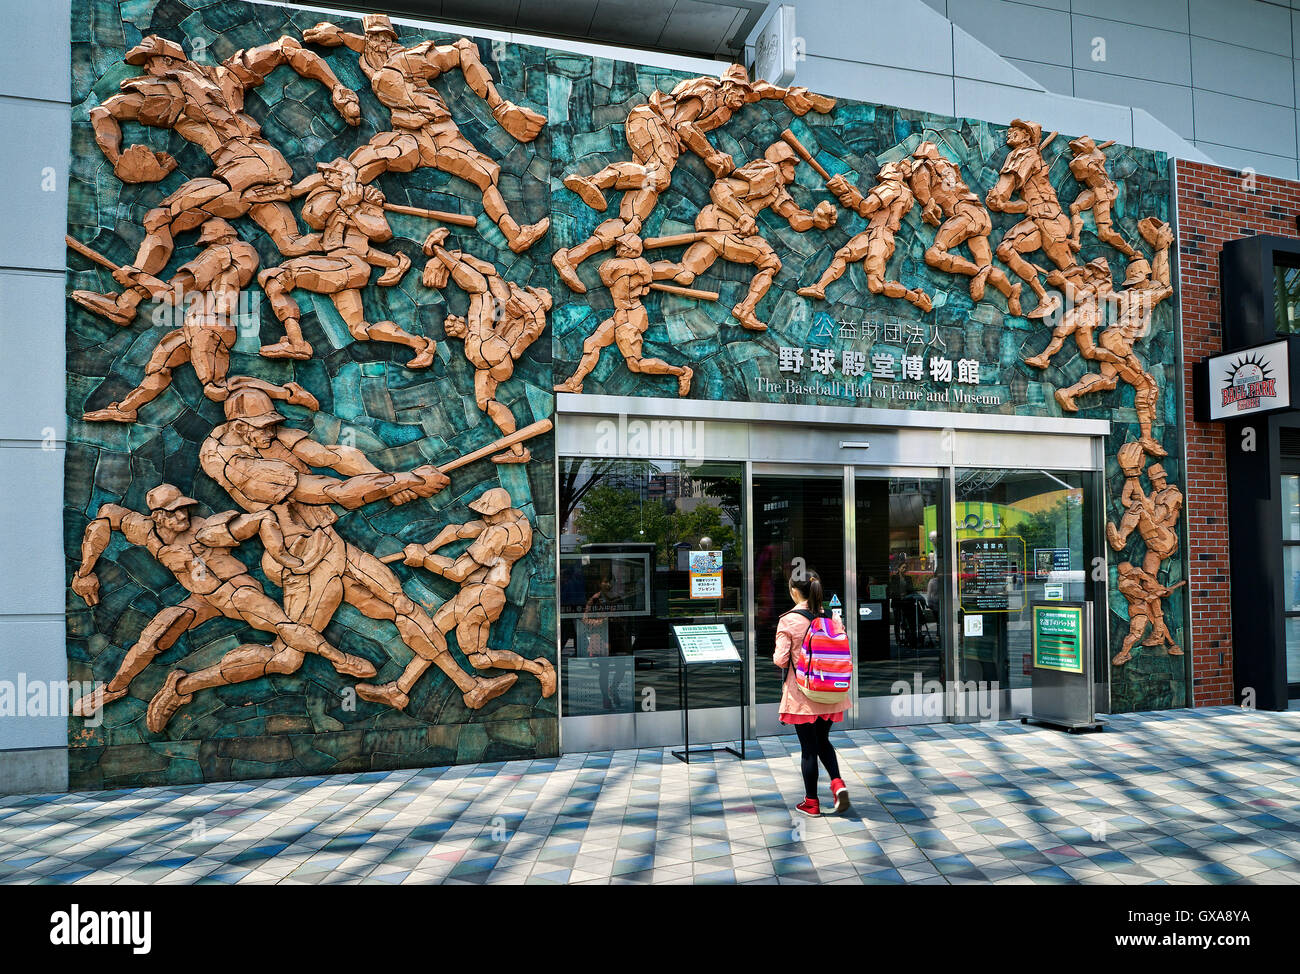 Giappone, isola di Honshu, Kanto, Tokyo, museo di baseball a Tokyo Dome. Immagini Stock